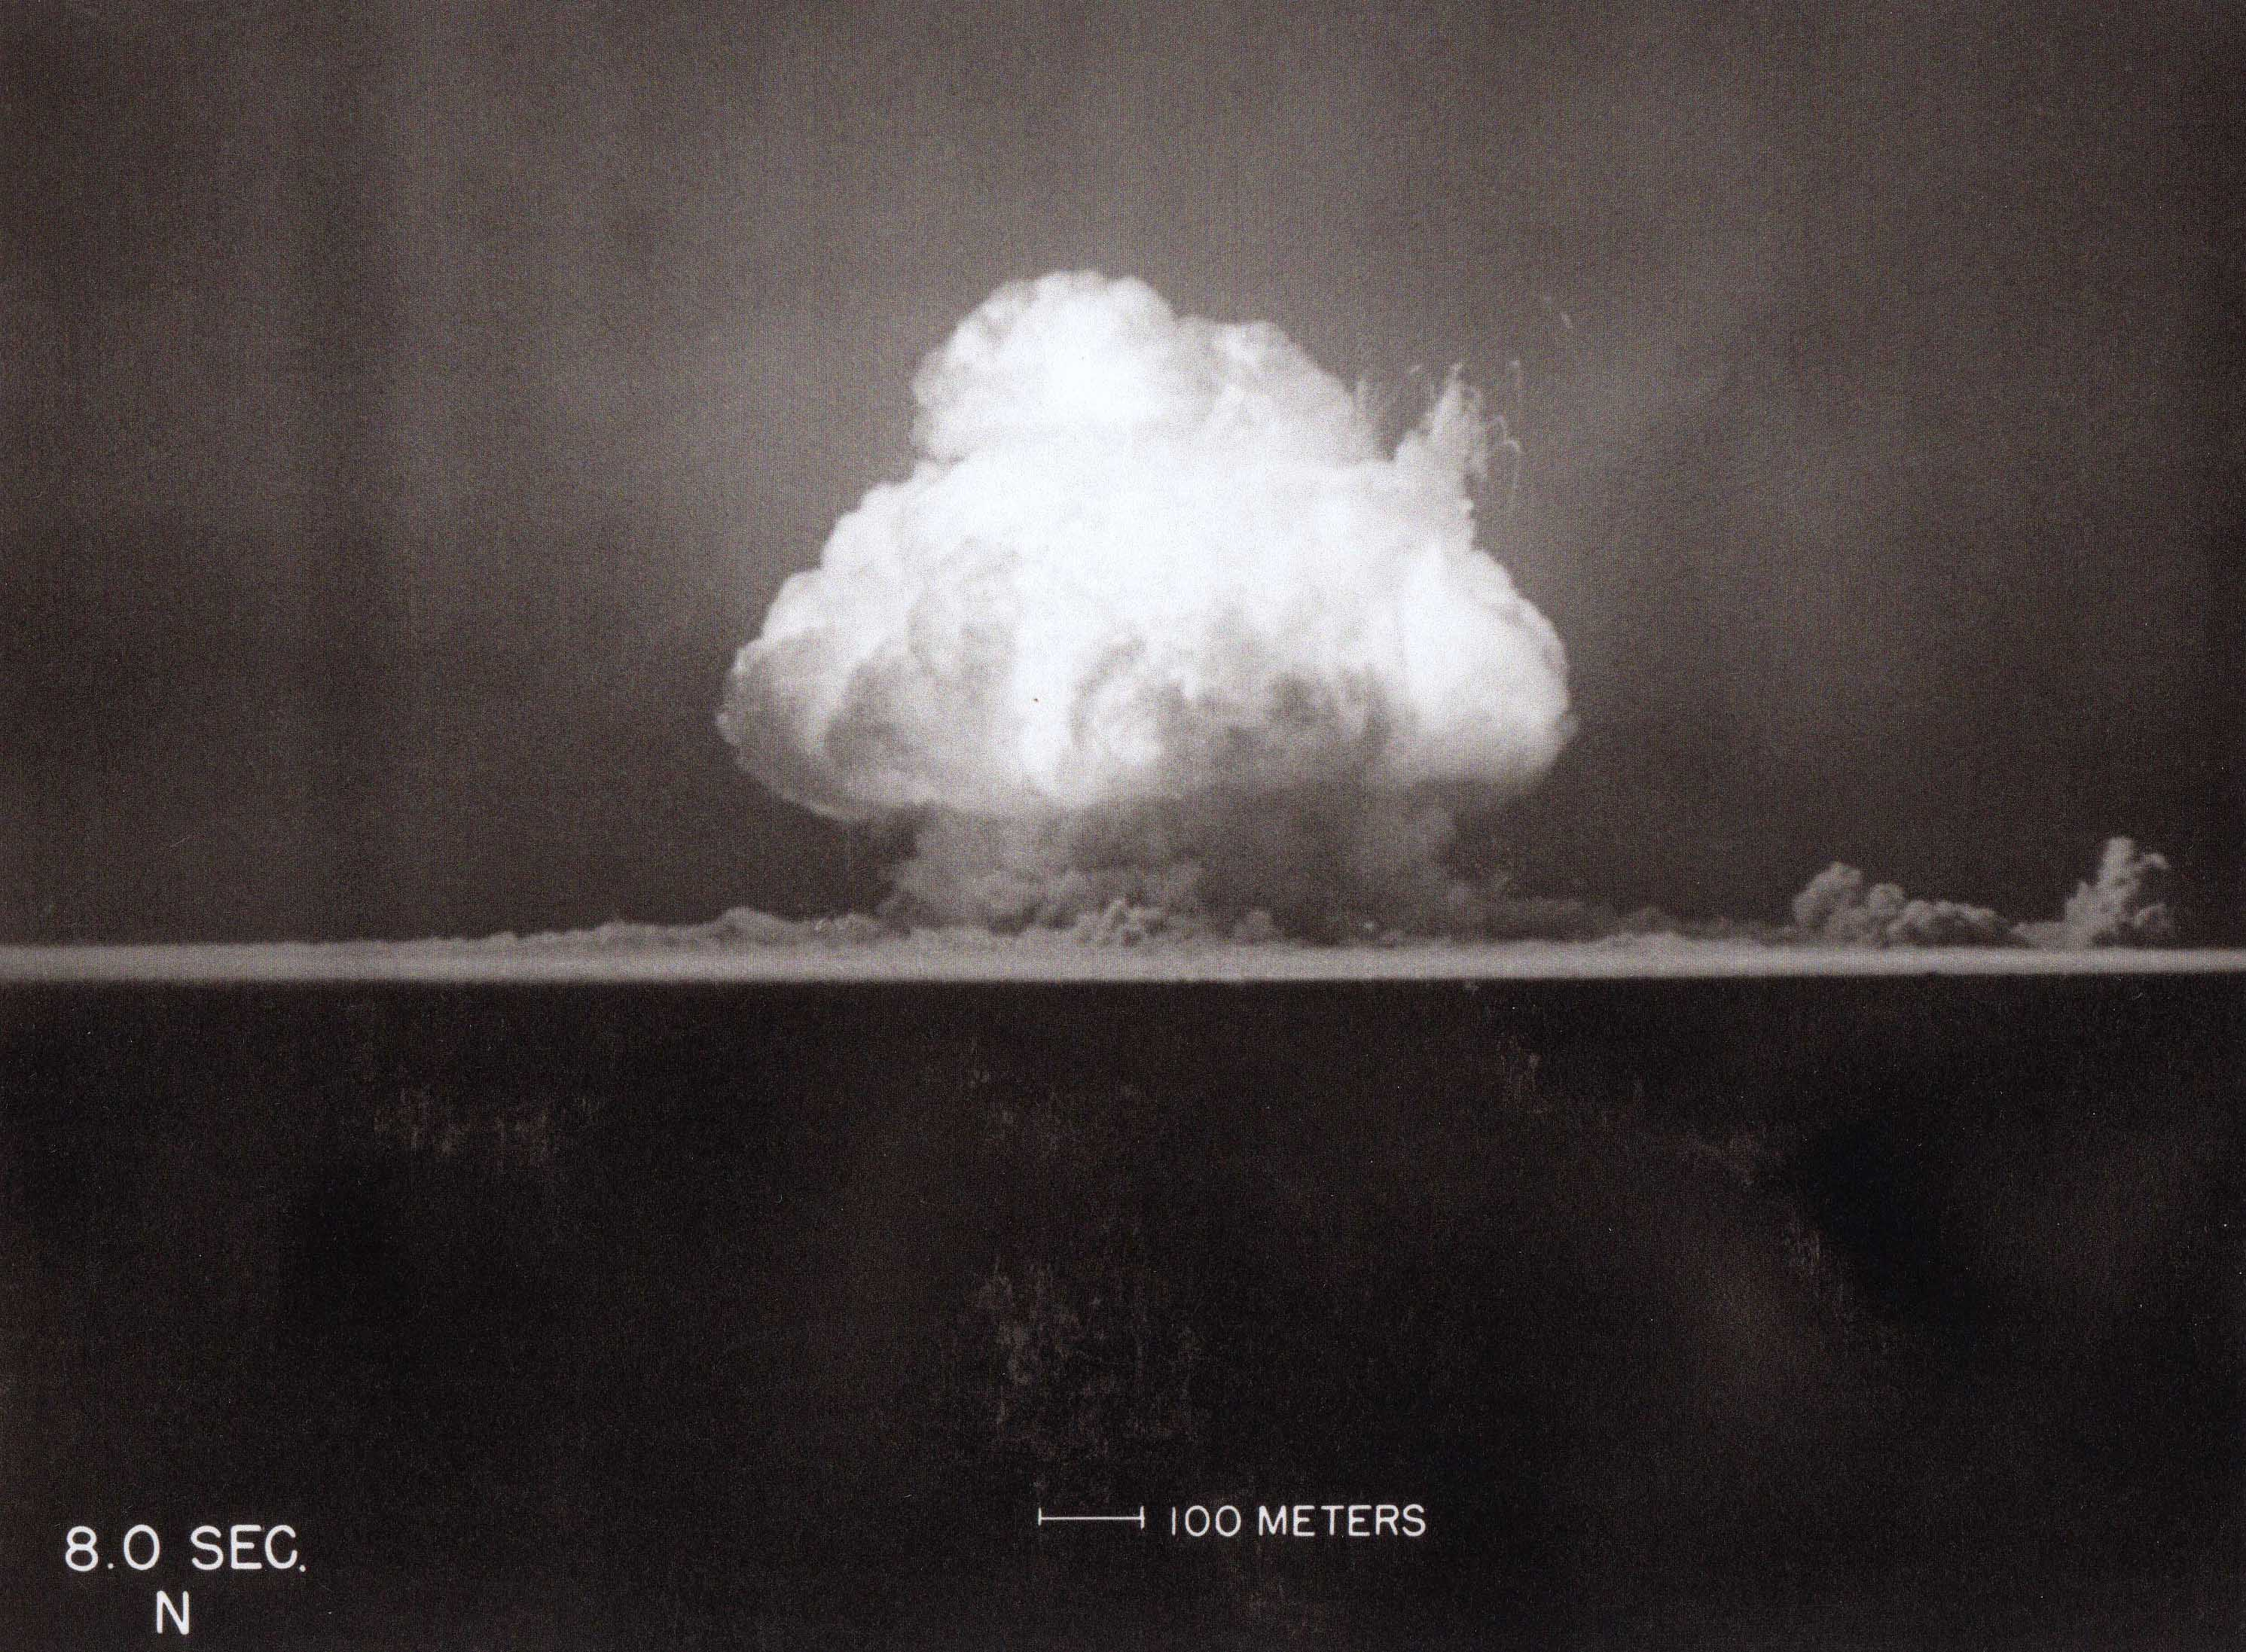 Trinity Detonation 8.0 seconds